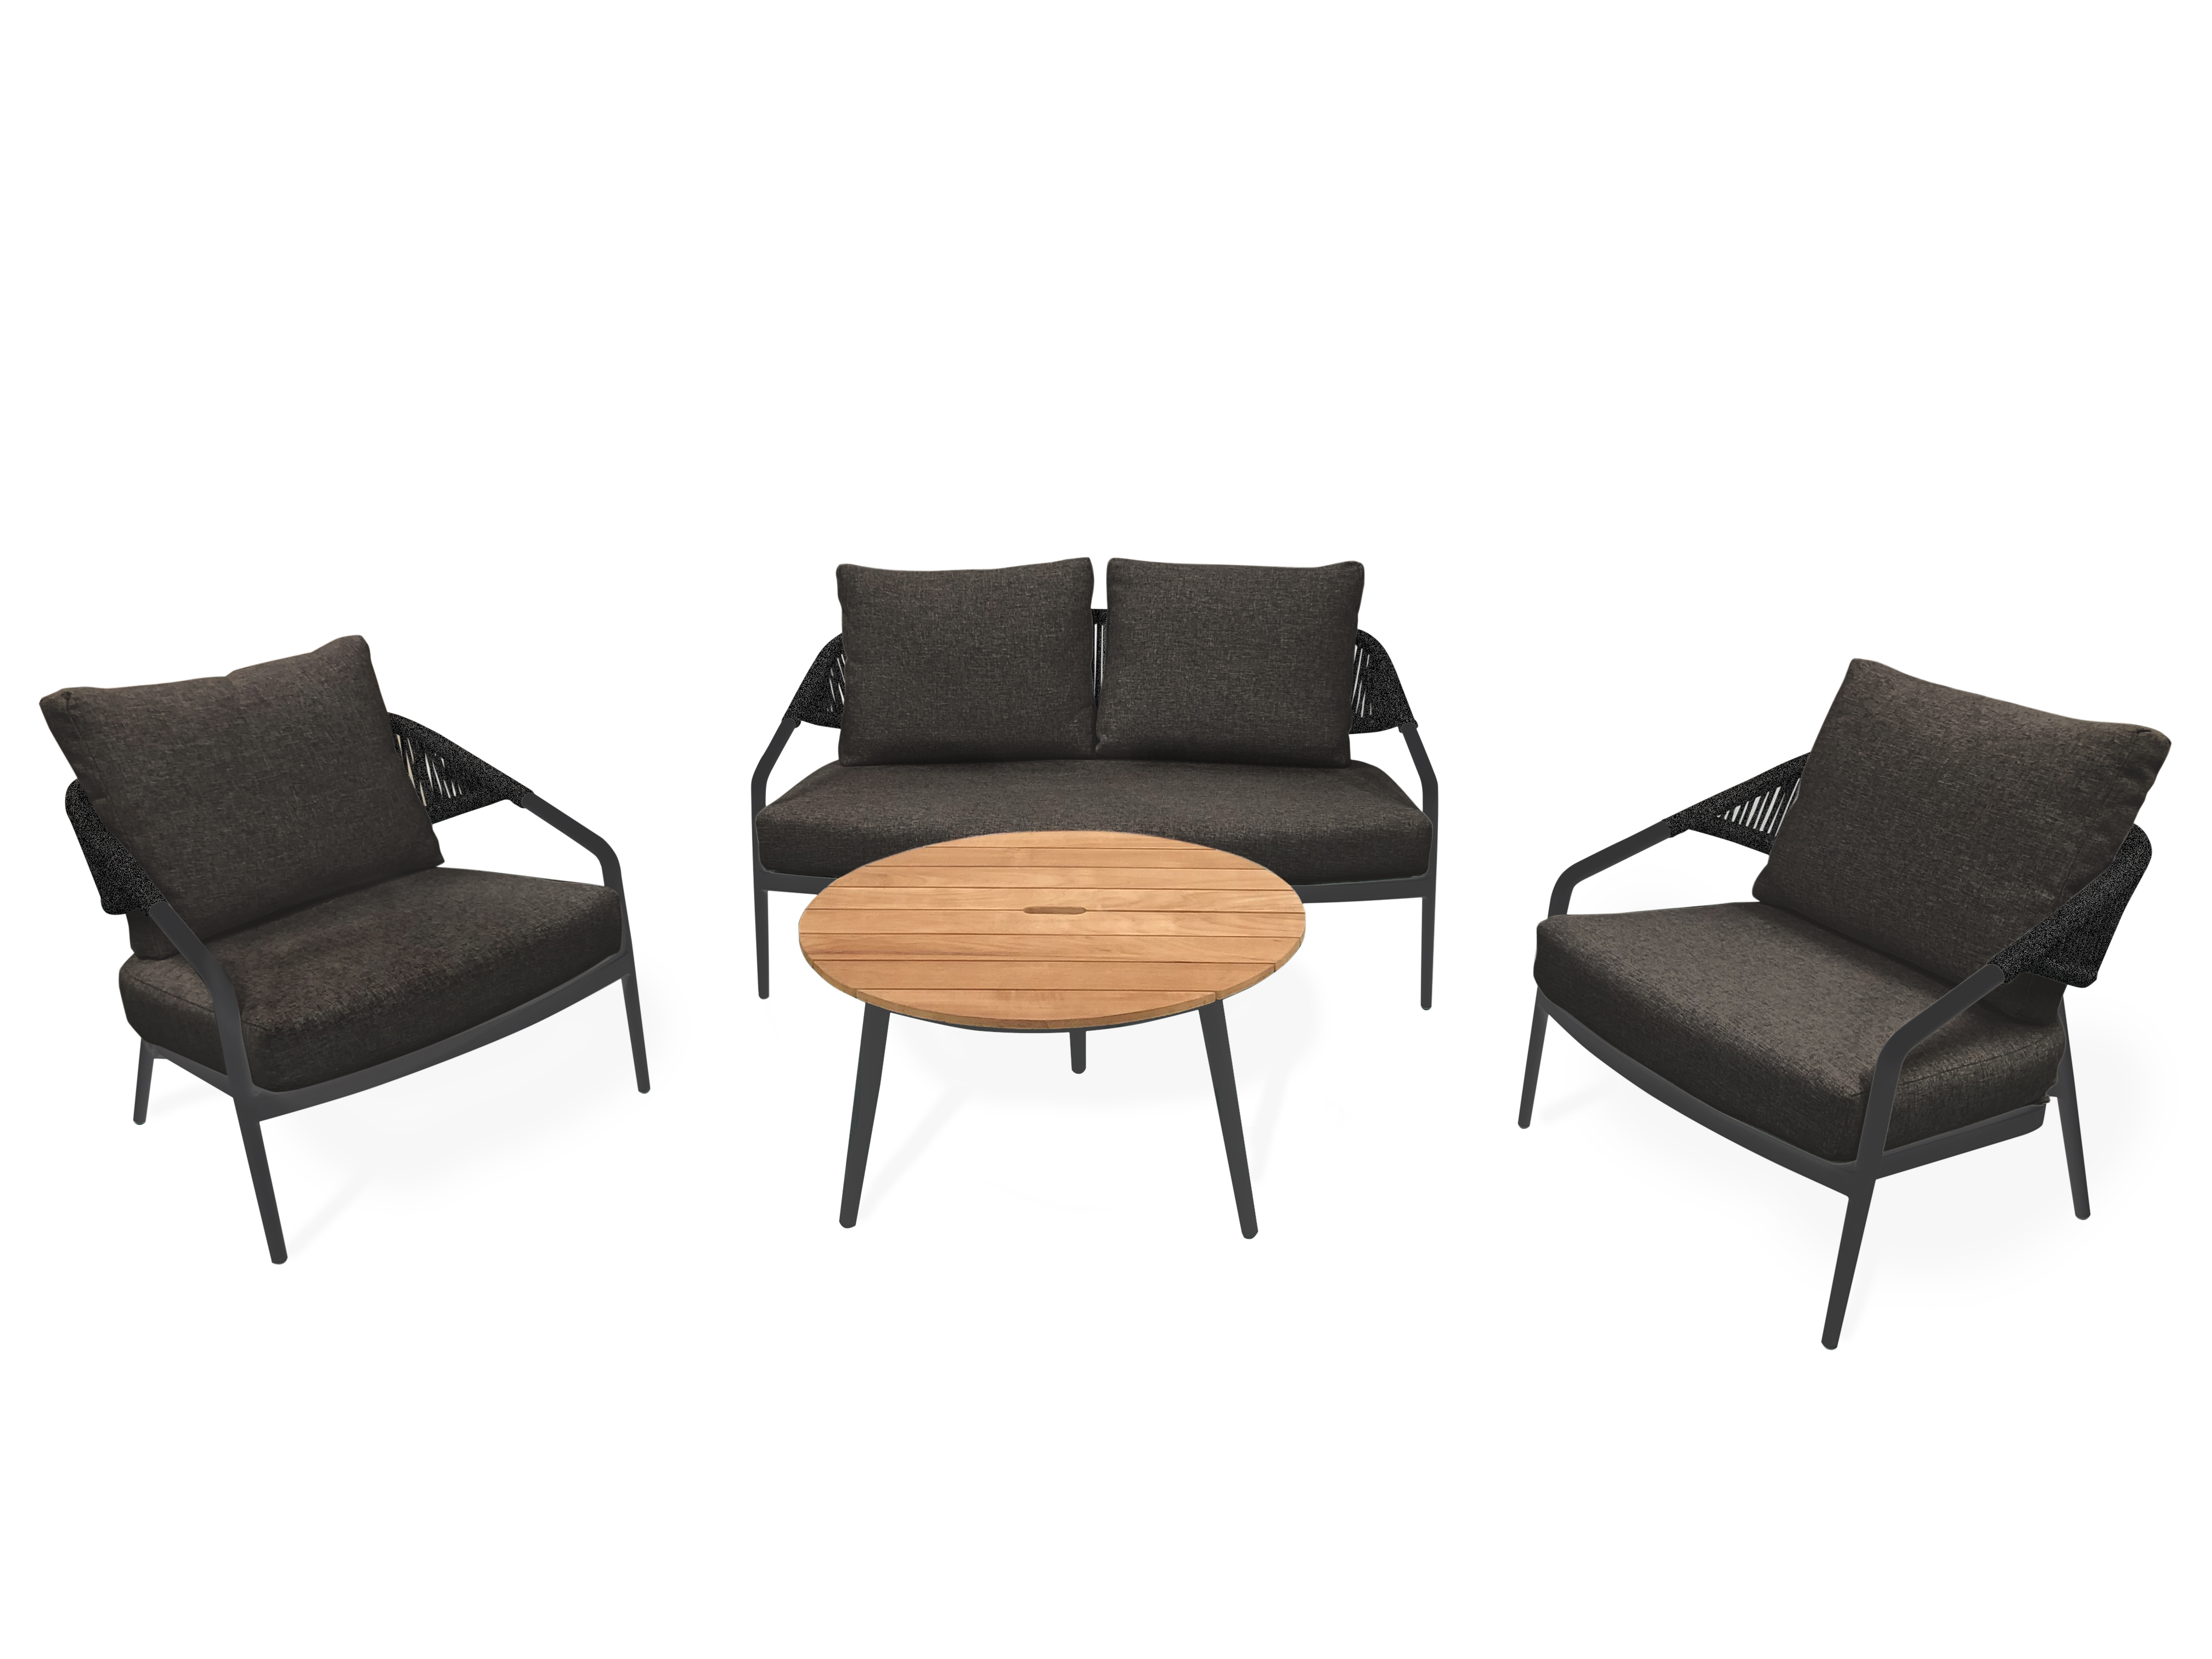 Zebra Gartenmöbel-Set Pixel Lounge